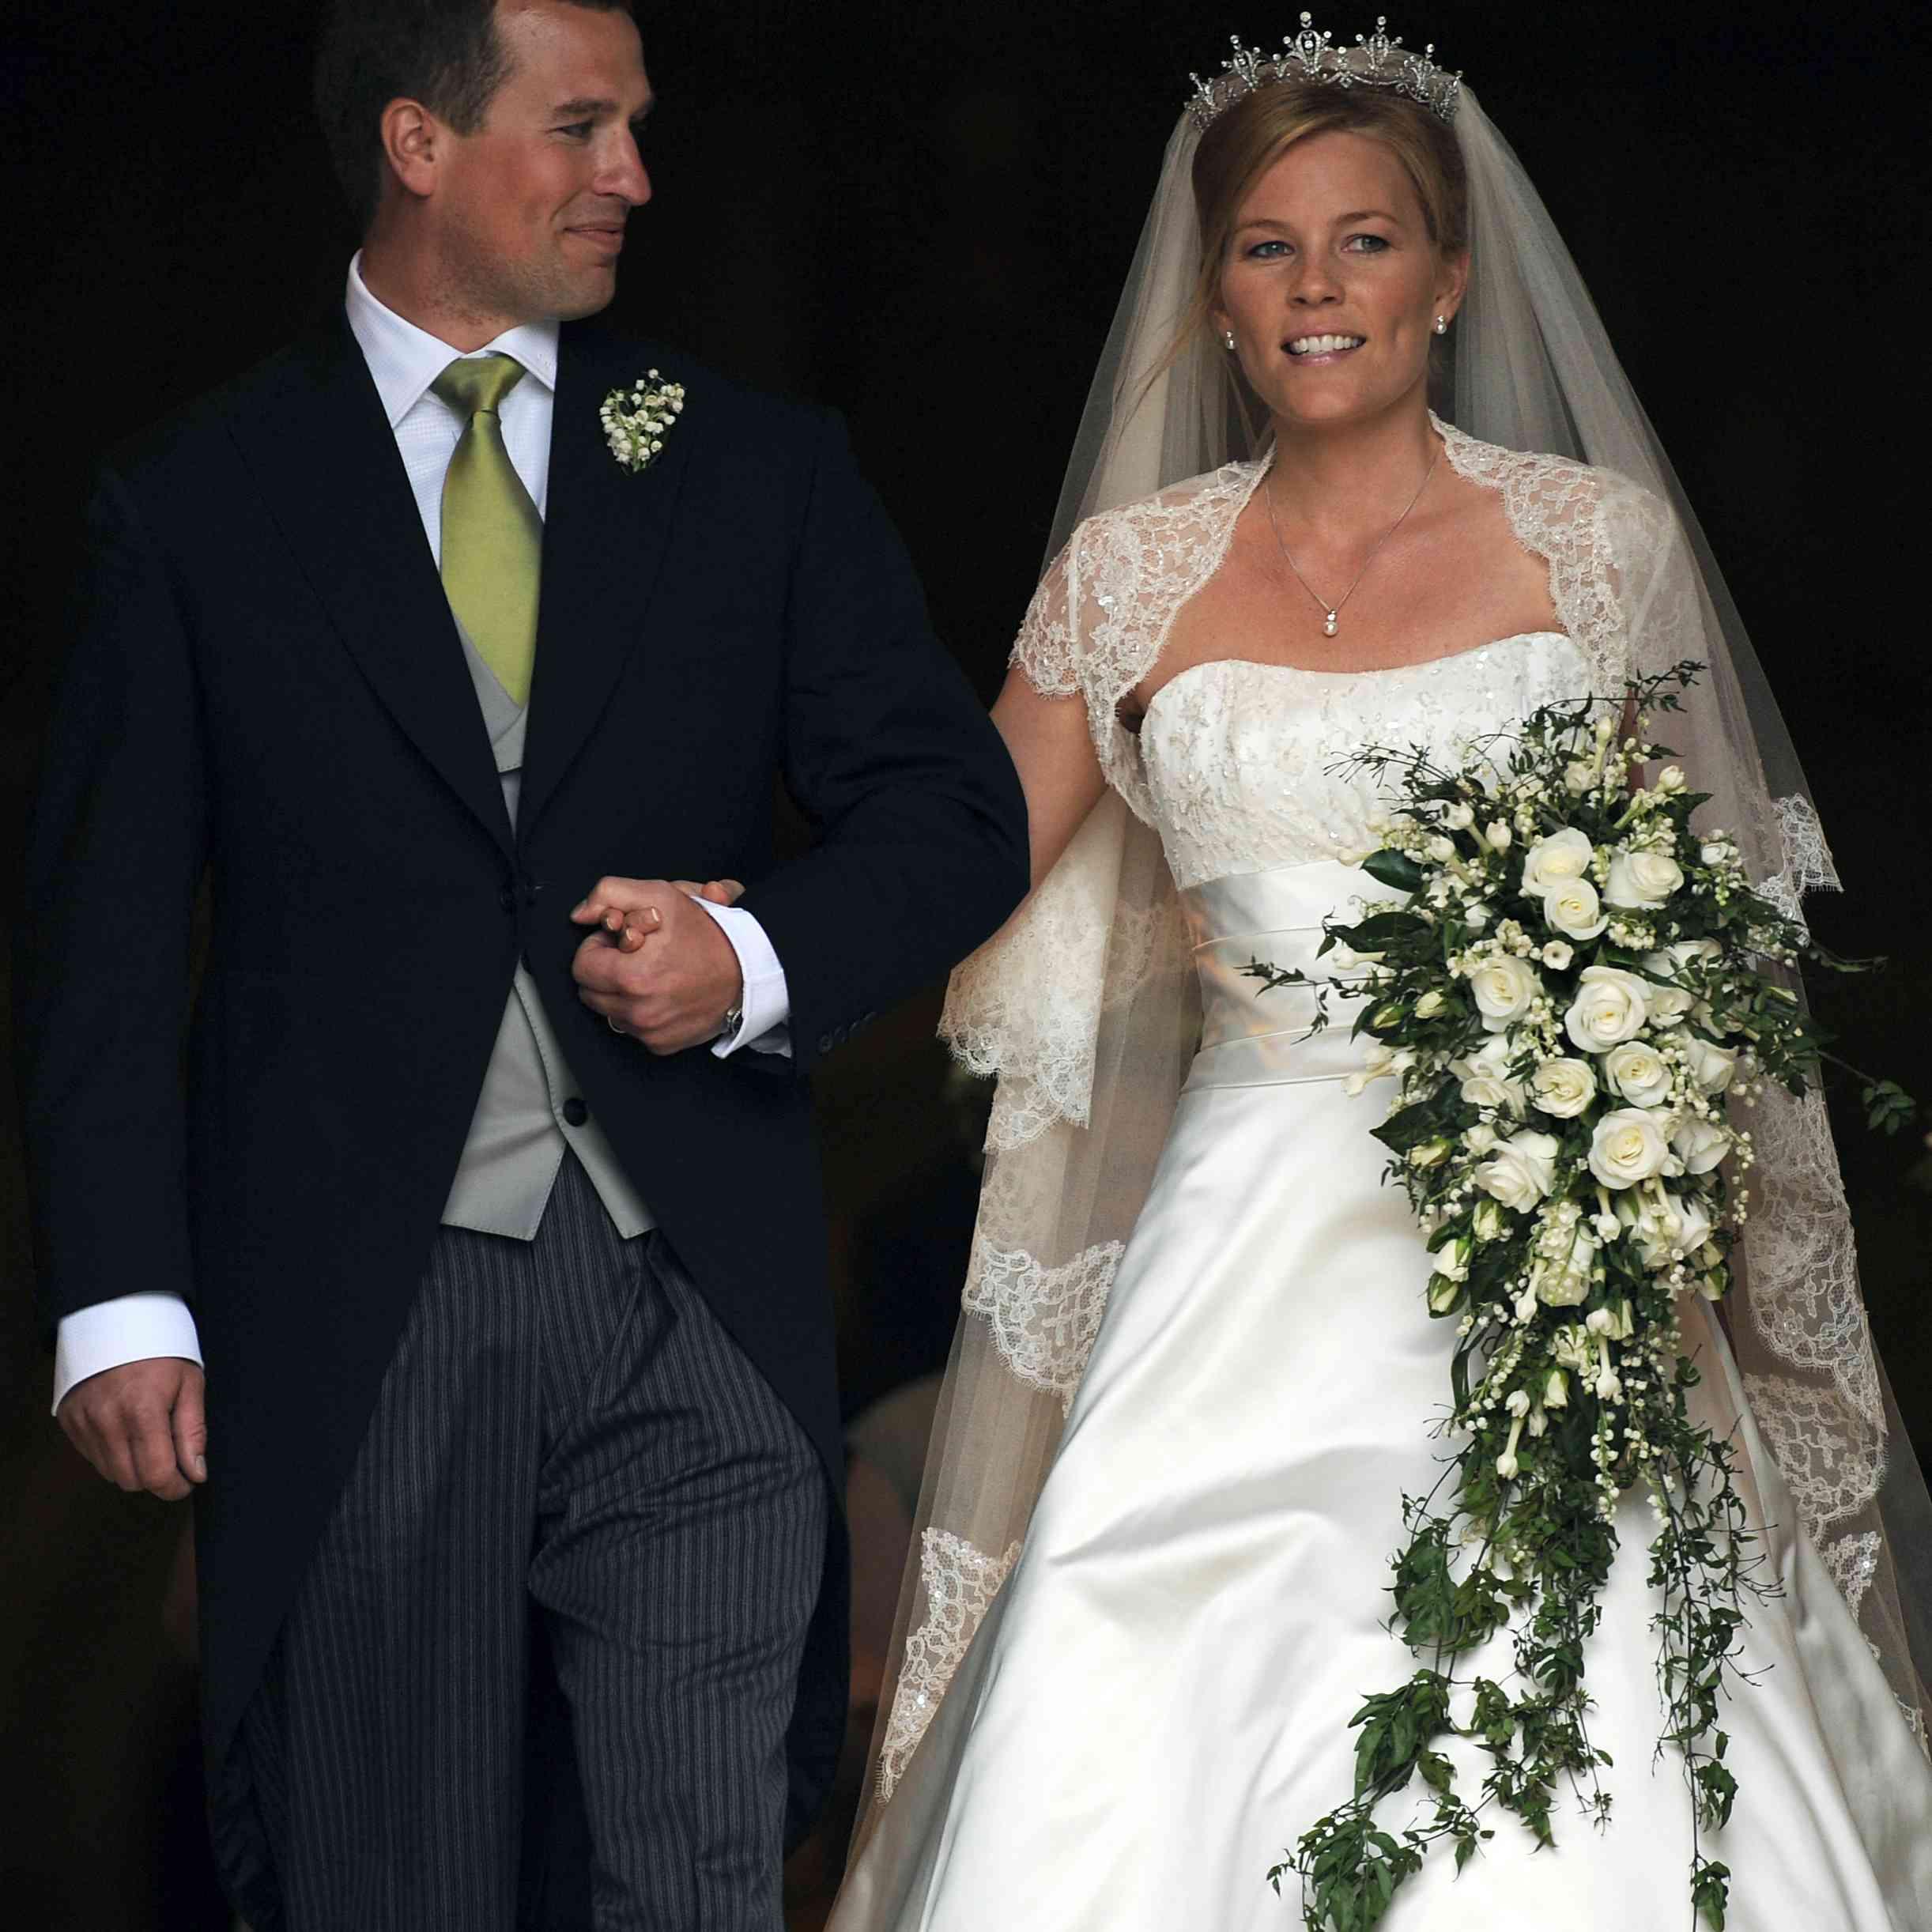 Peter Phillips marries Autumn Kelly